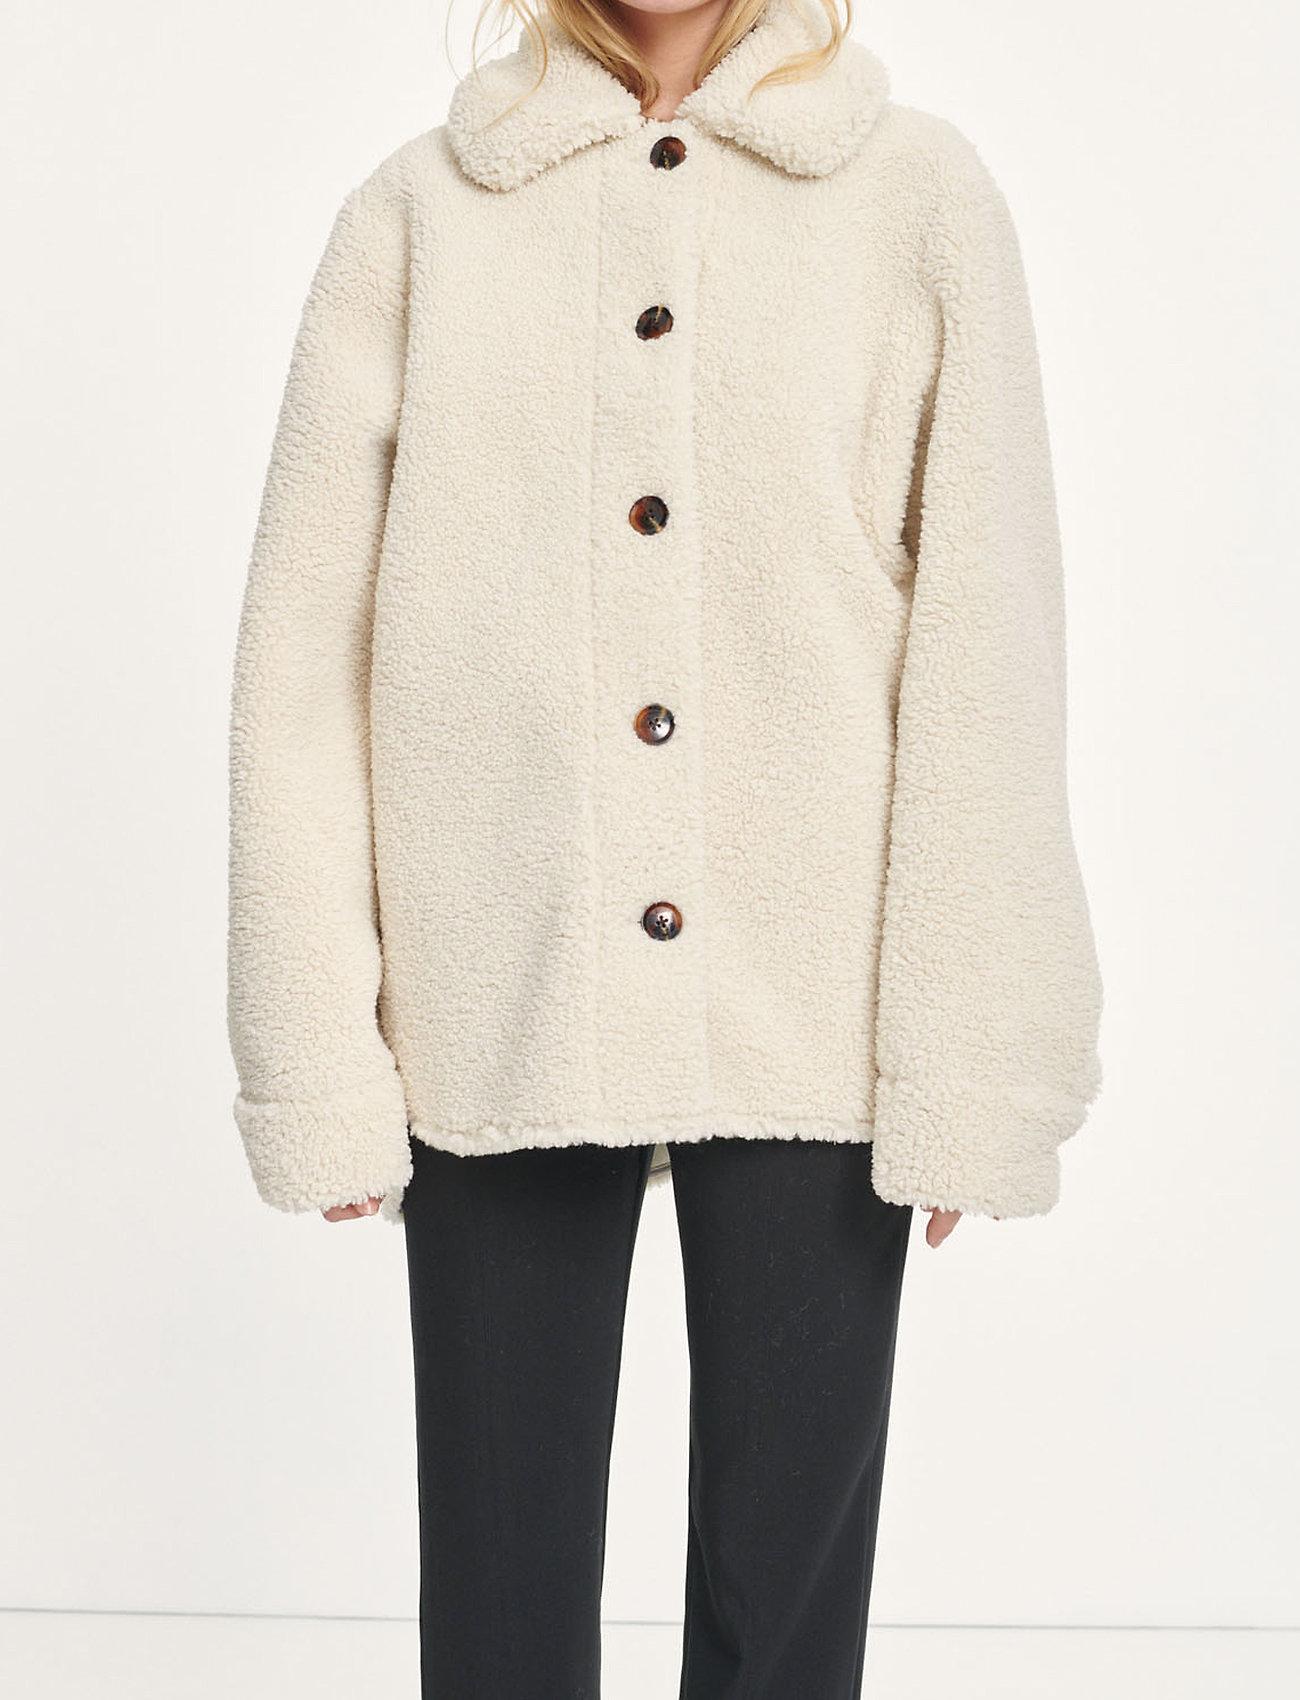 Samsøe Samsøe - Aylin jacket 12856 - wool jackets - whisper white - 0